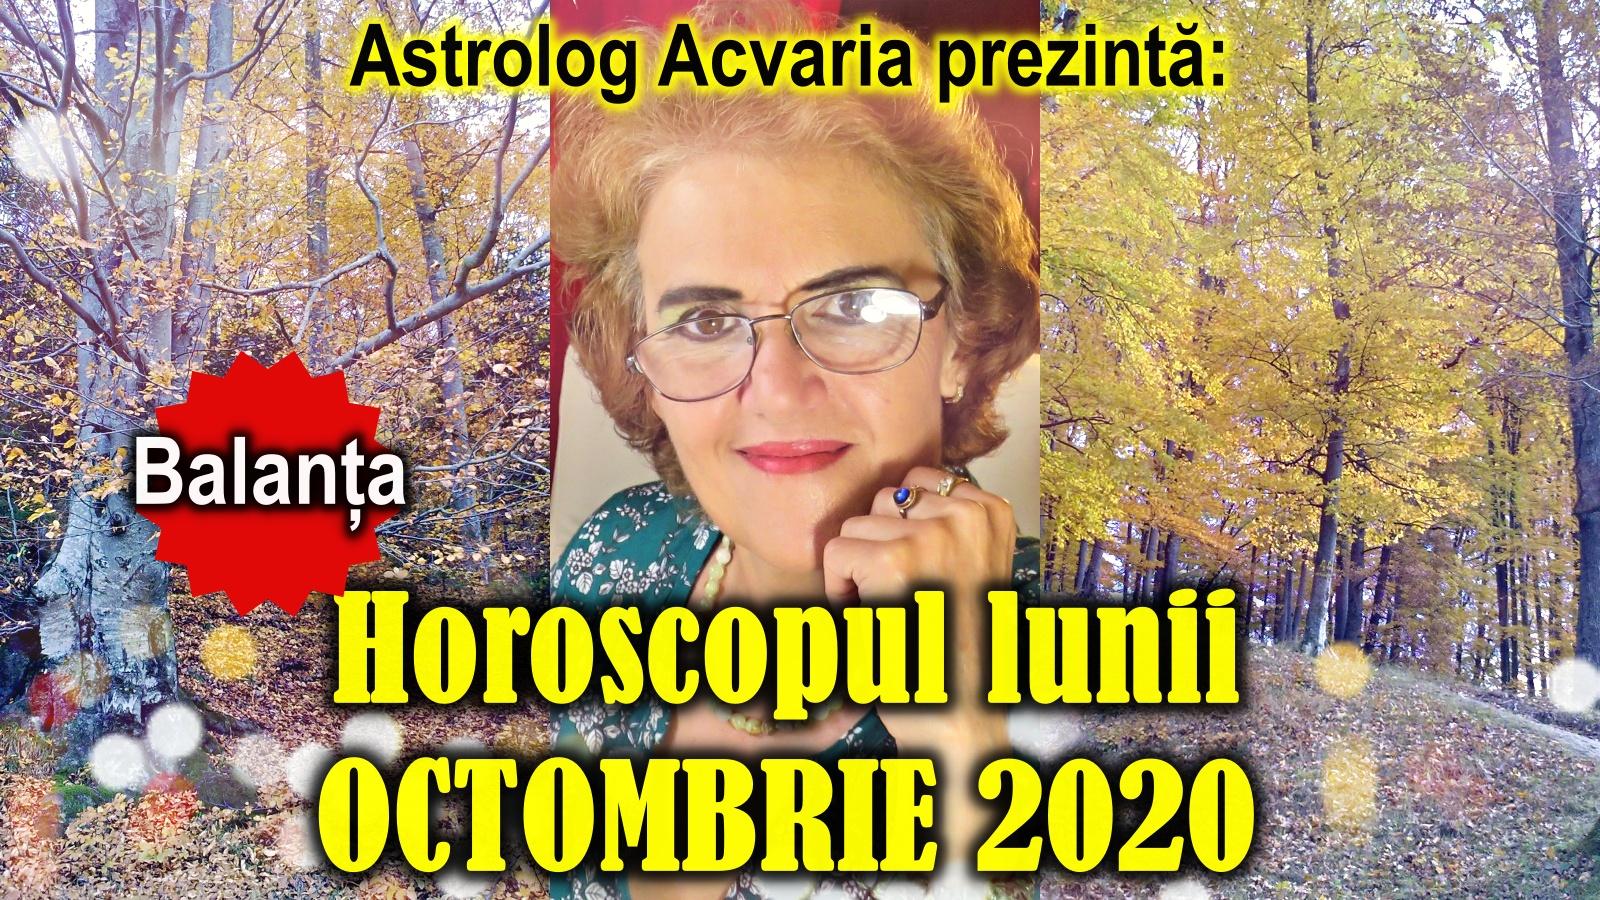 Horoscopul lunii OCTOMBRIE * Zodia BALANTEI